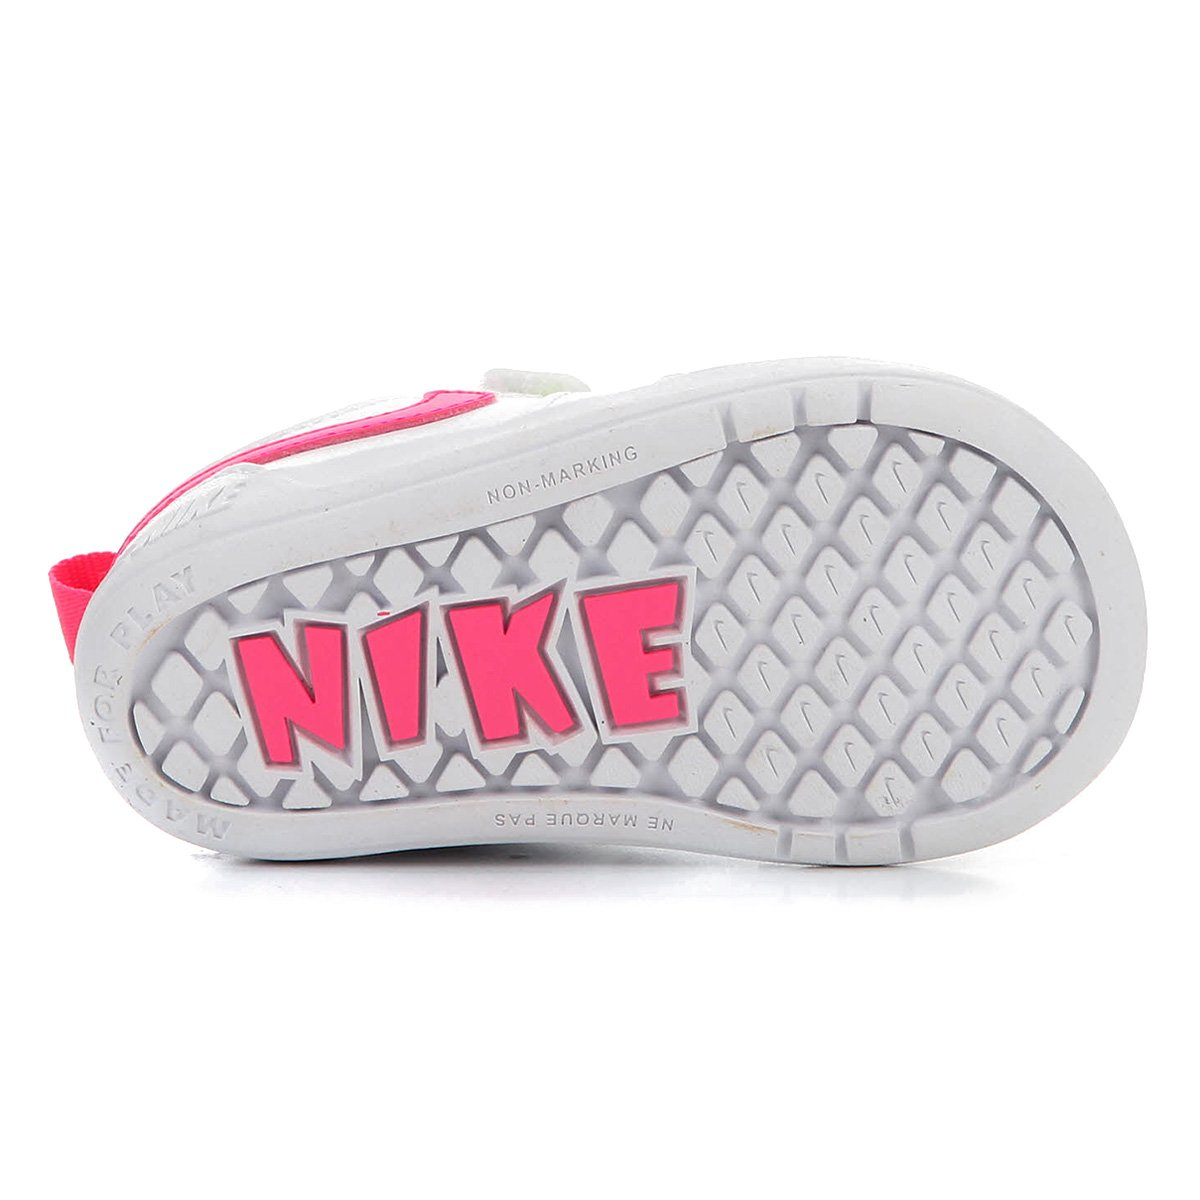 Tênis Infantil Nike Pico 5 Velcro - Tam: 24 - 3